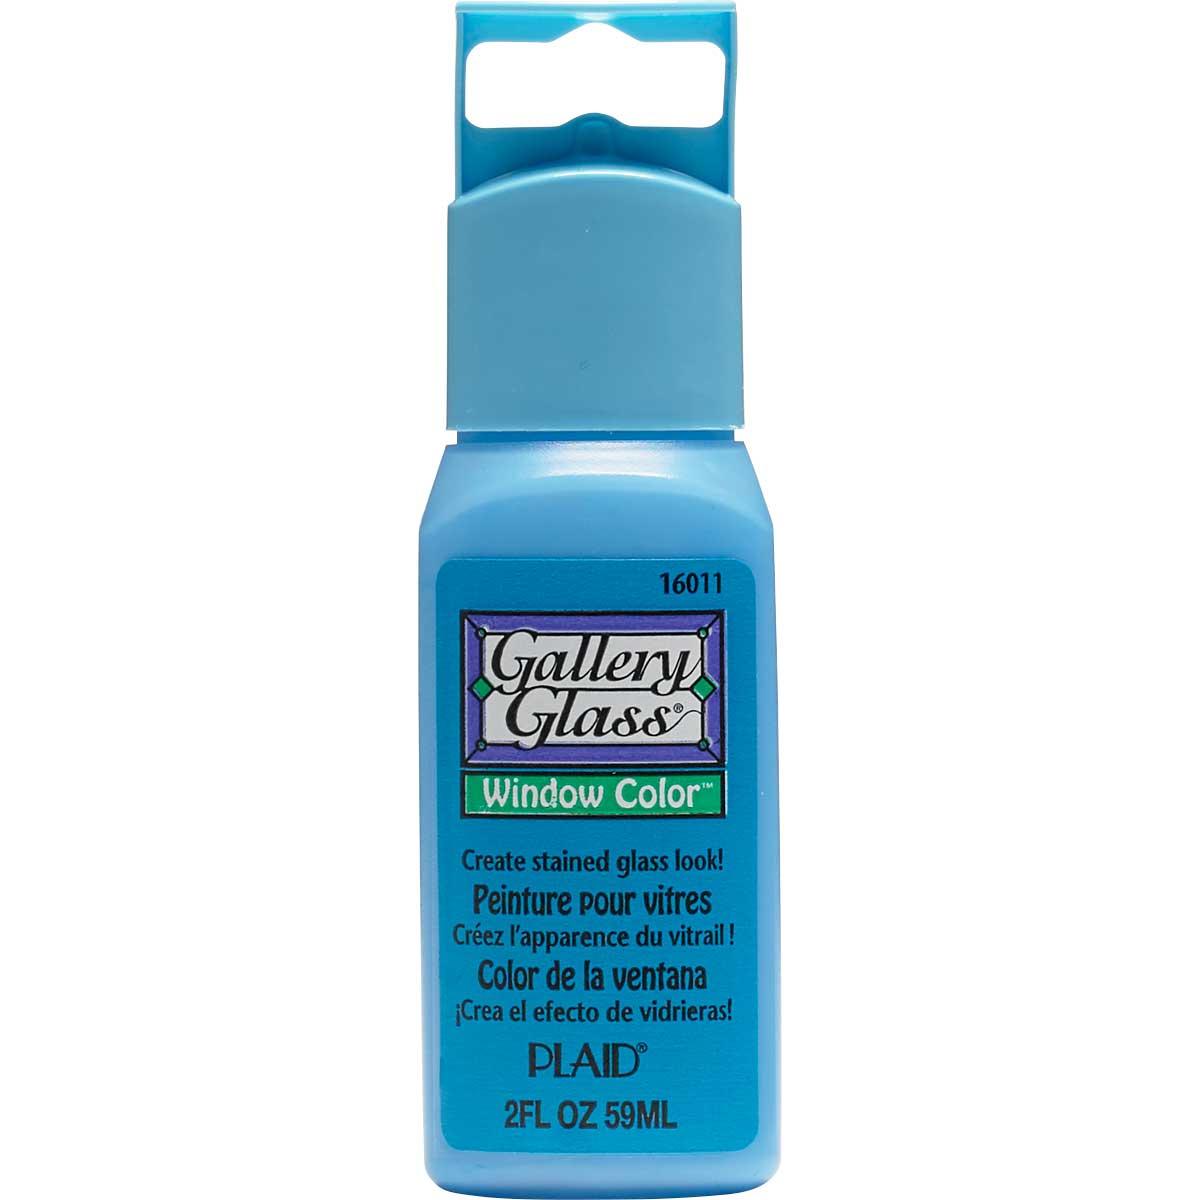 Gallery Glass ® Window Color™ - Blue Diamond, 2 oz. - 16011